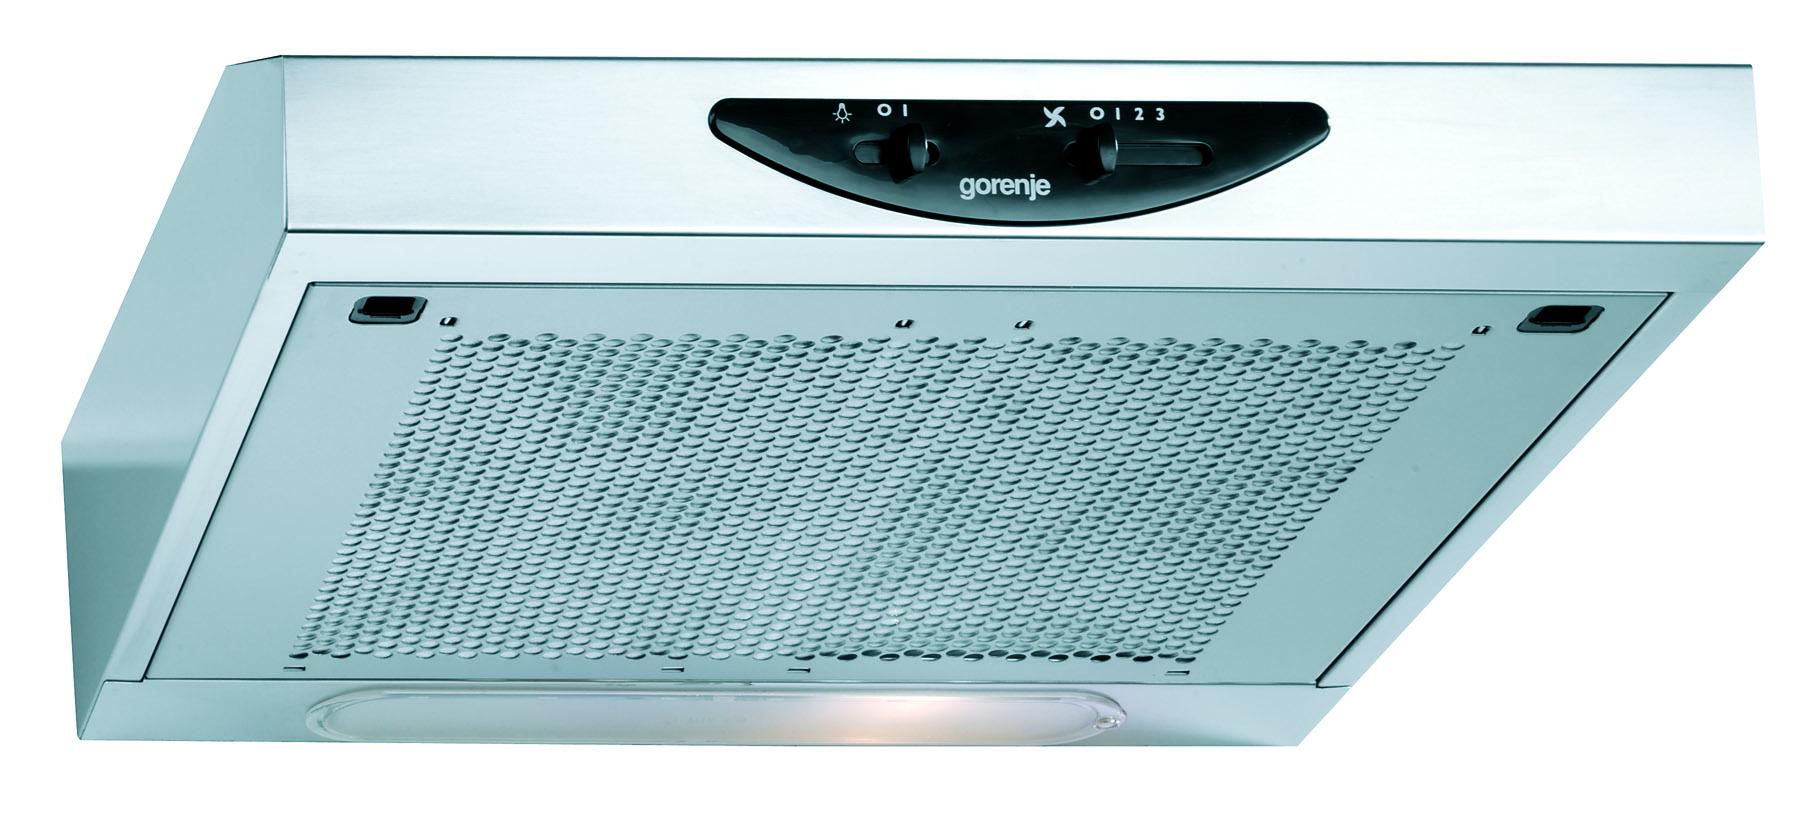 Gorenje DU511E Podugradni kuhinjski aspirator 49,9 × 13,2 × 51 cm